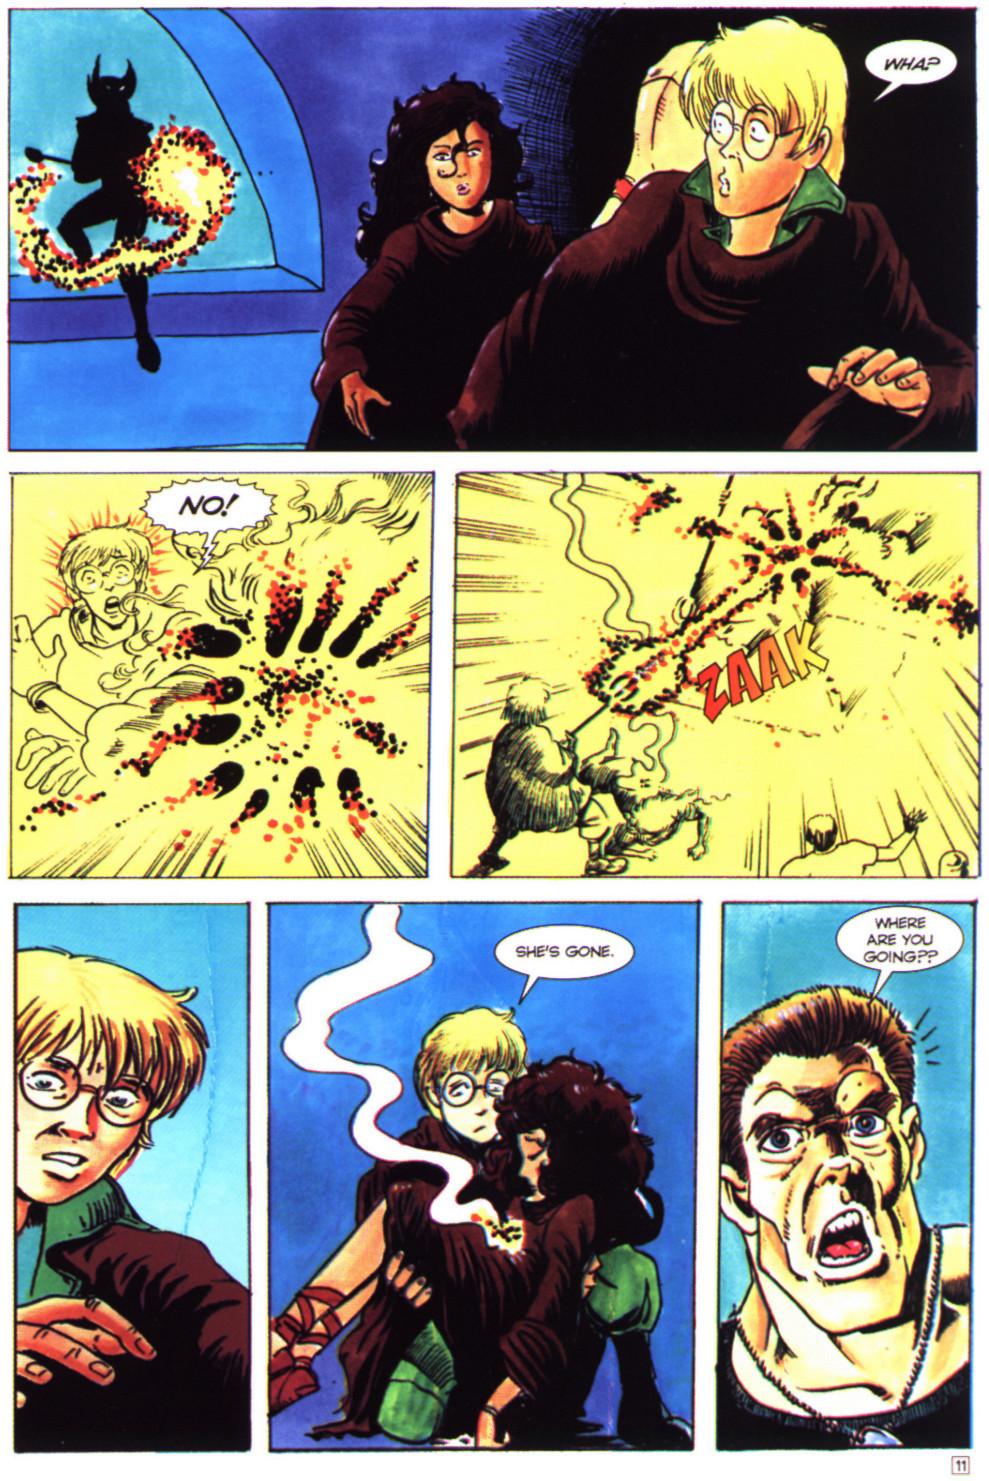 Read online Stargate comic -  Issue #4 - 13